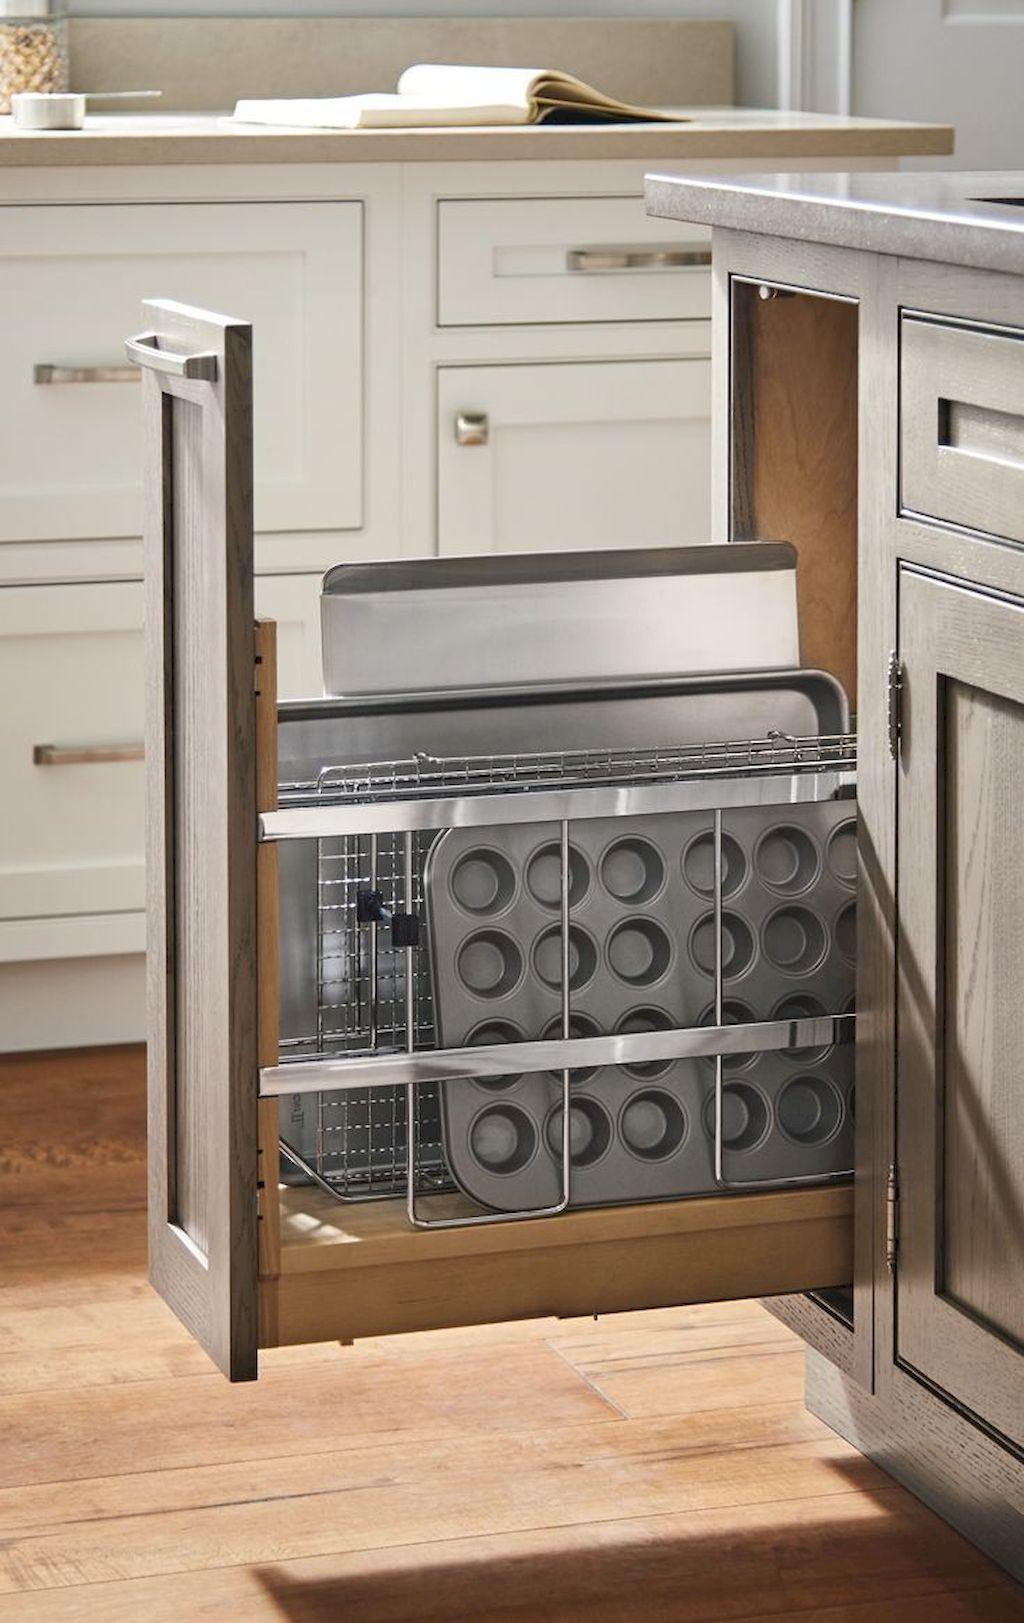 Prodigious Kitchen Cupboard Concepts Kitchen Cabinet Remodel Diy Kitchen Renovation Home Decor Kitchen